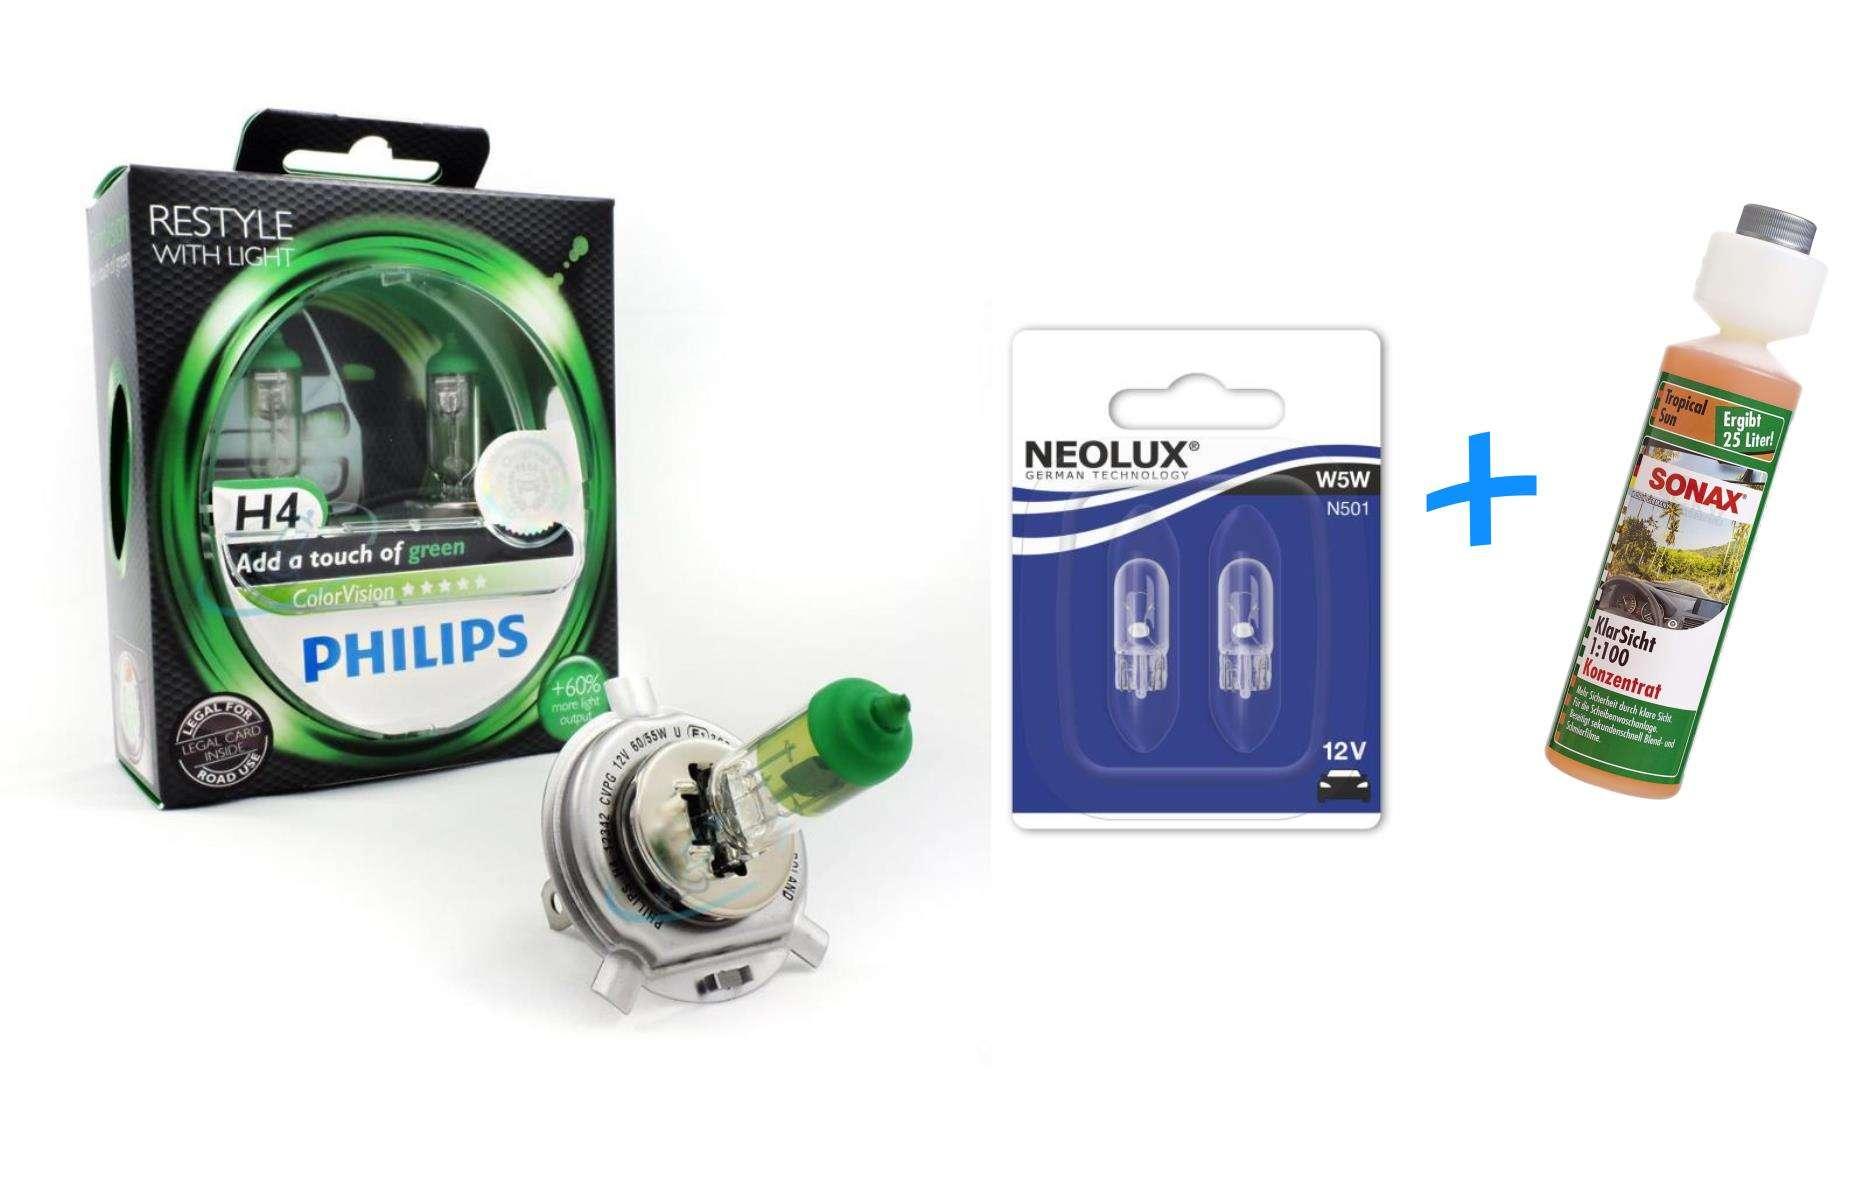 H4-COLORVISION-60-piu-luce-2st-PHILIPS-w5w-Neolux-SONAX-lucidita